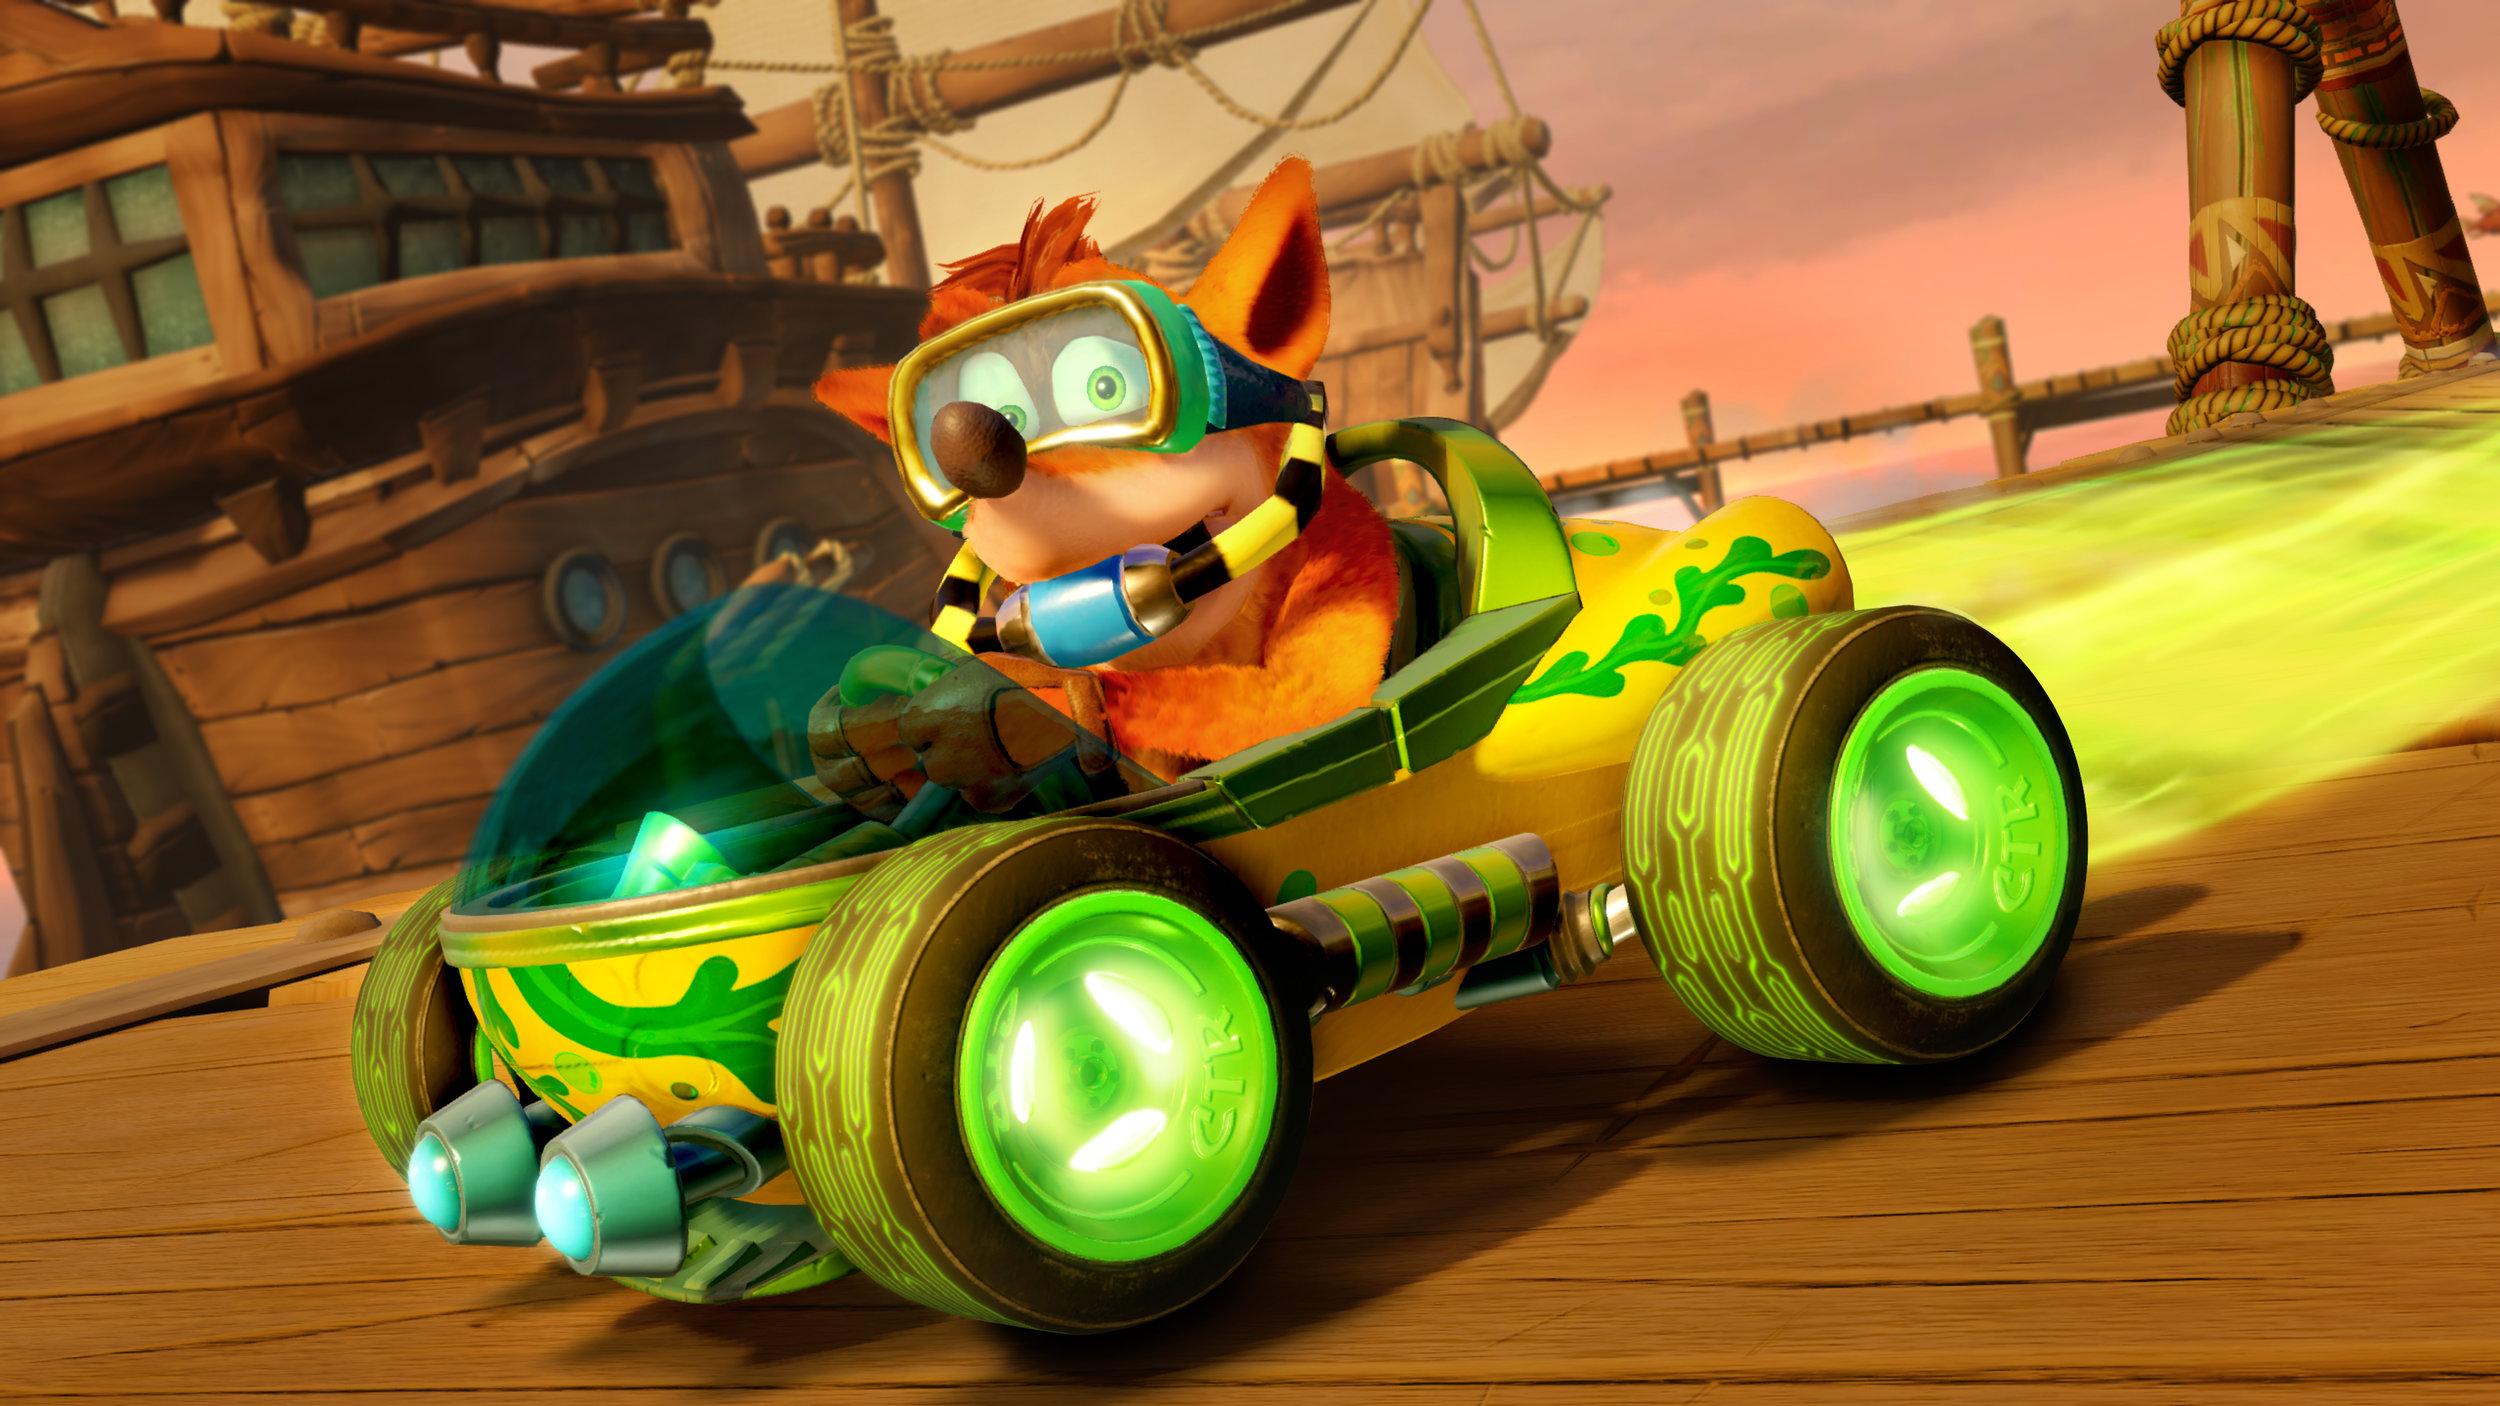 Crash Team Racing Nitro-Fueled Screen 2.jpg